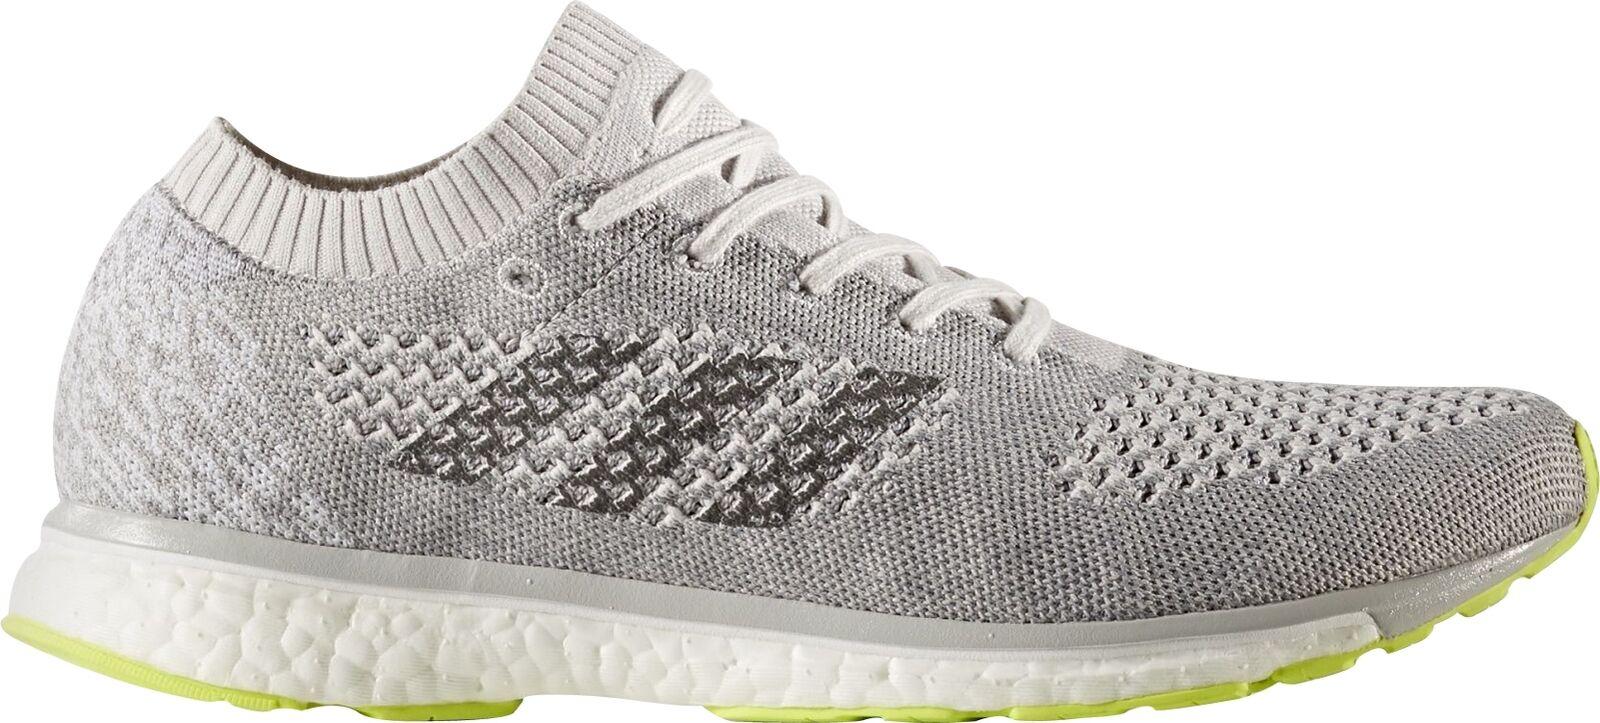 Adidas Adizero Primeknit Boost Running shoes Grey Unisex Mens Womens Trainers